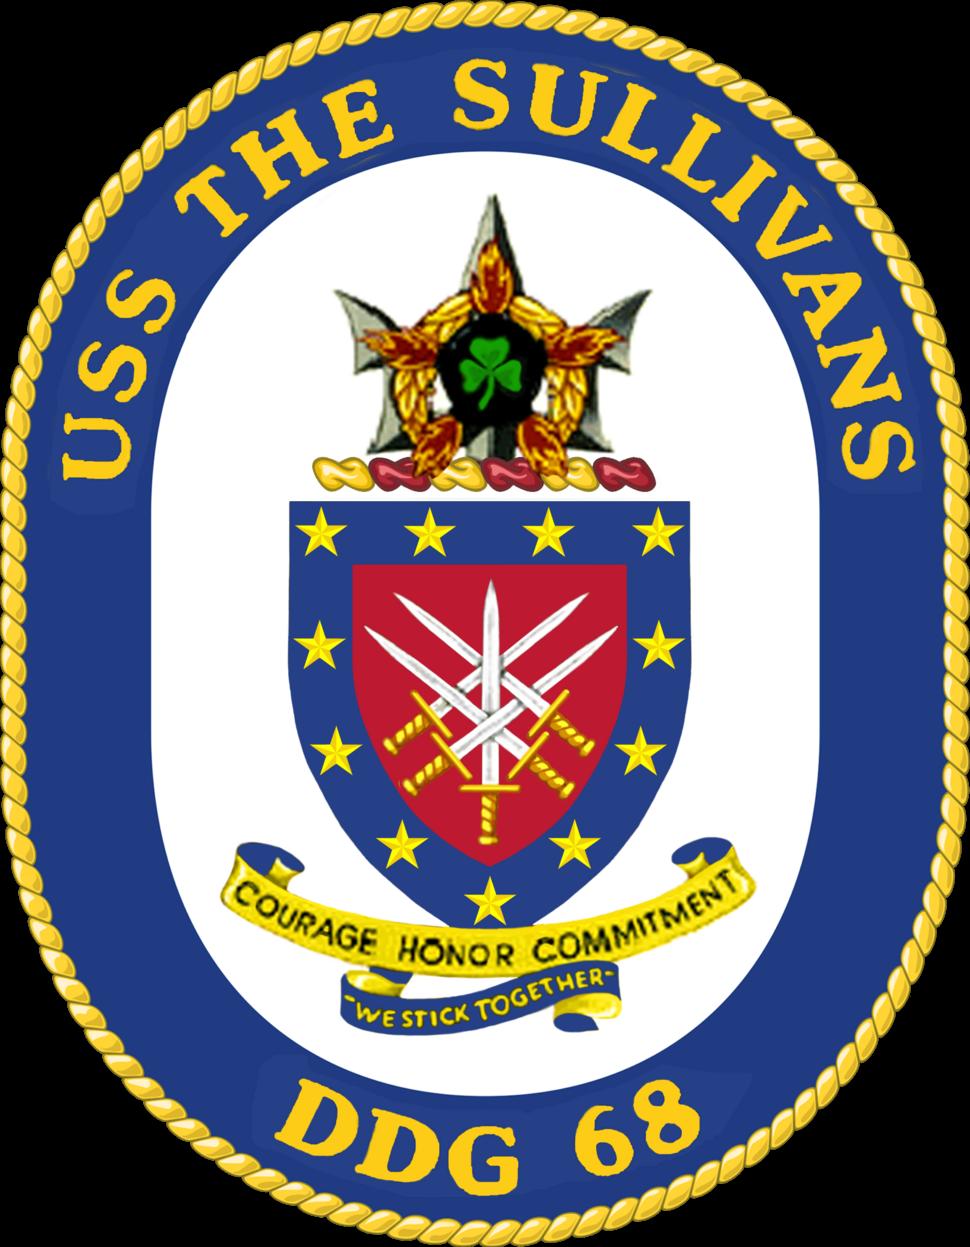 USS The Sullivans crest